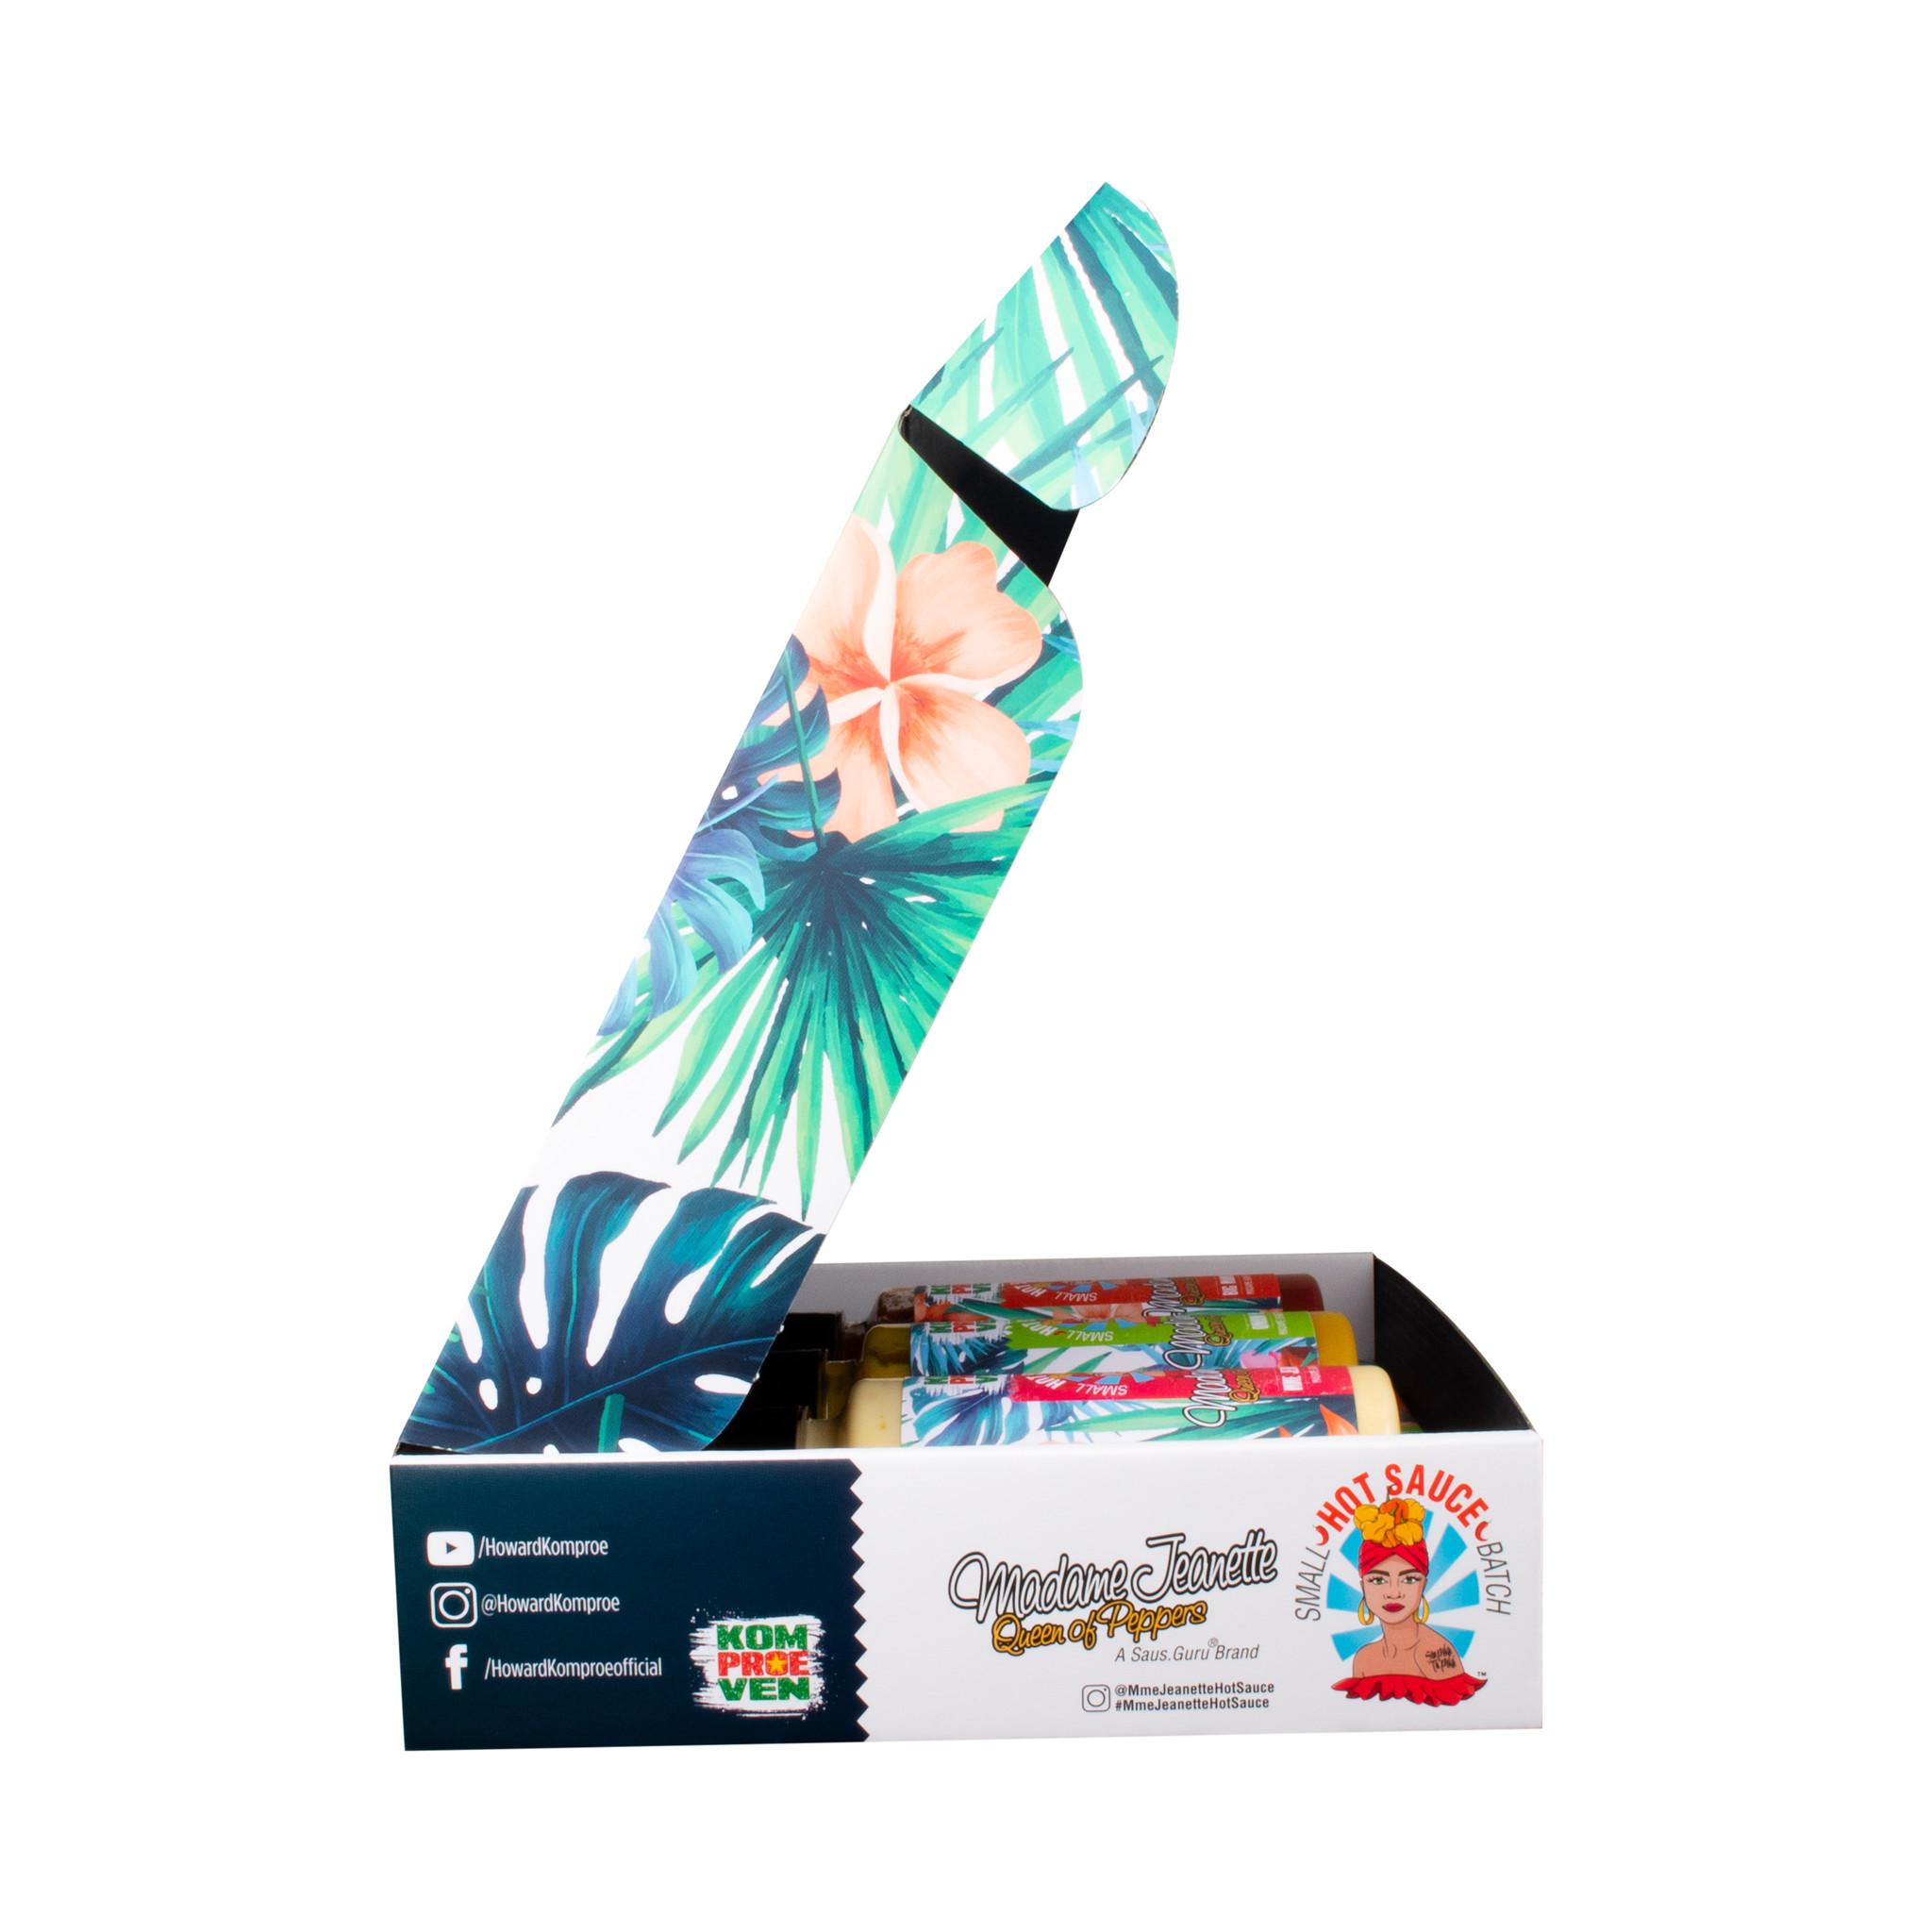 Komproeven X Madame Jeanette™ Giftbox-1